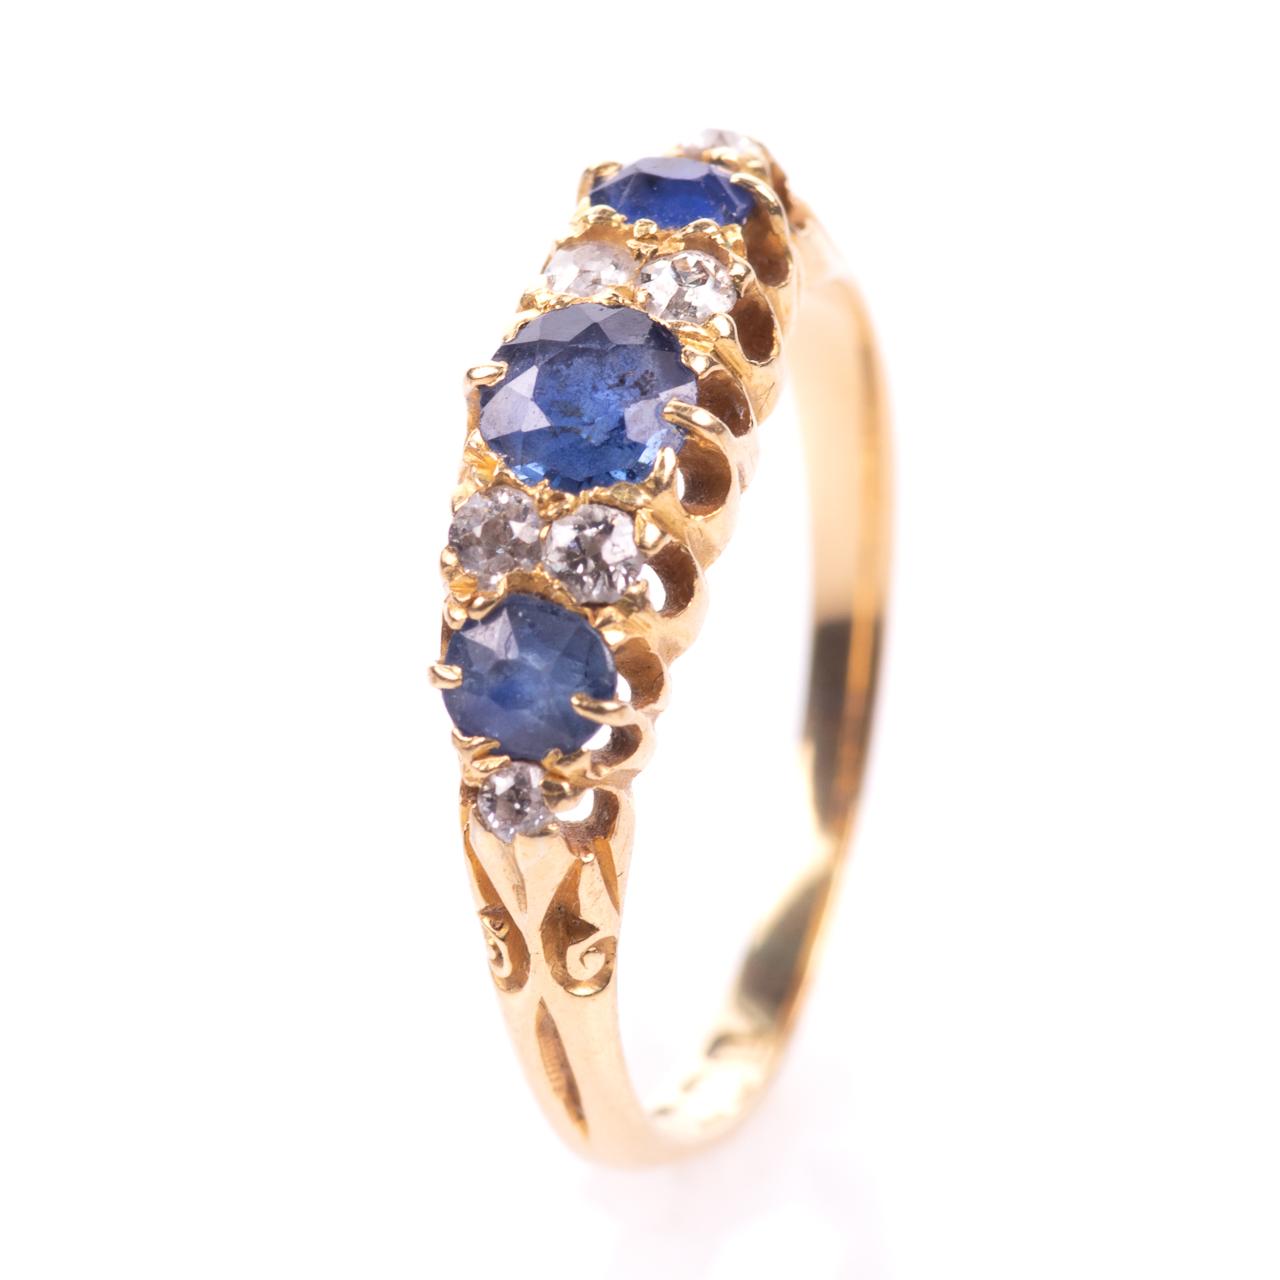 18ct Gold George V 1ct Sapphire & Diamond Ring London 1908